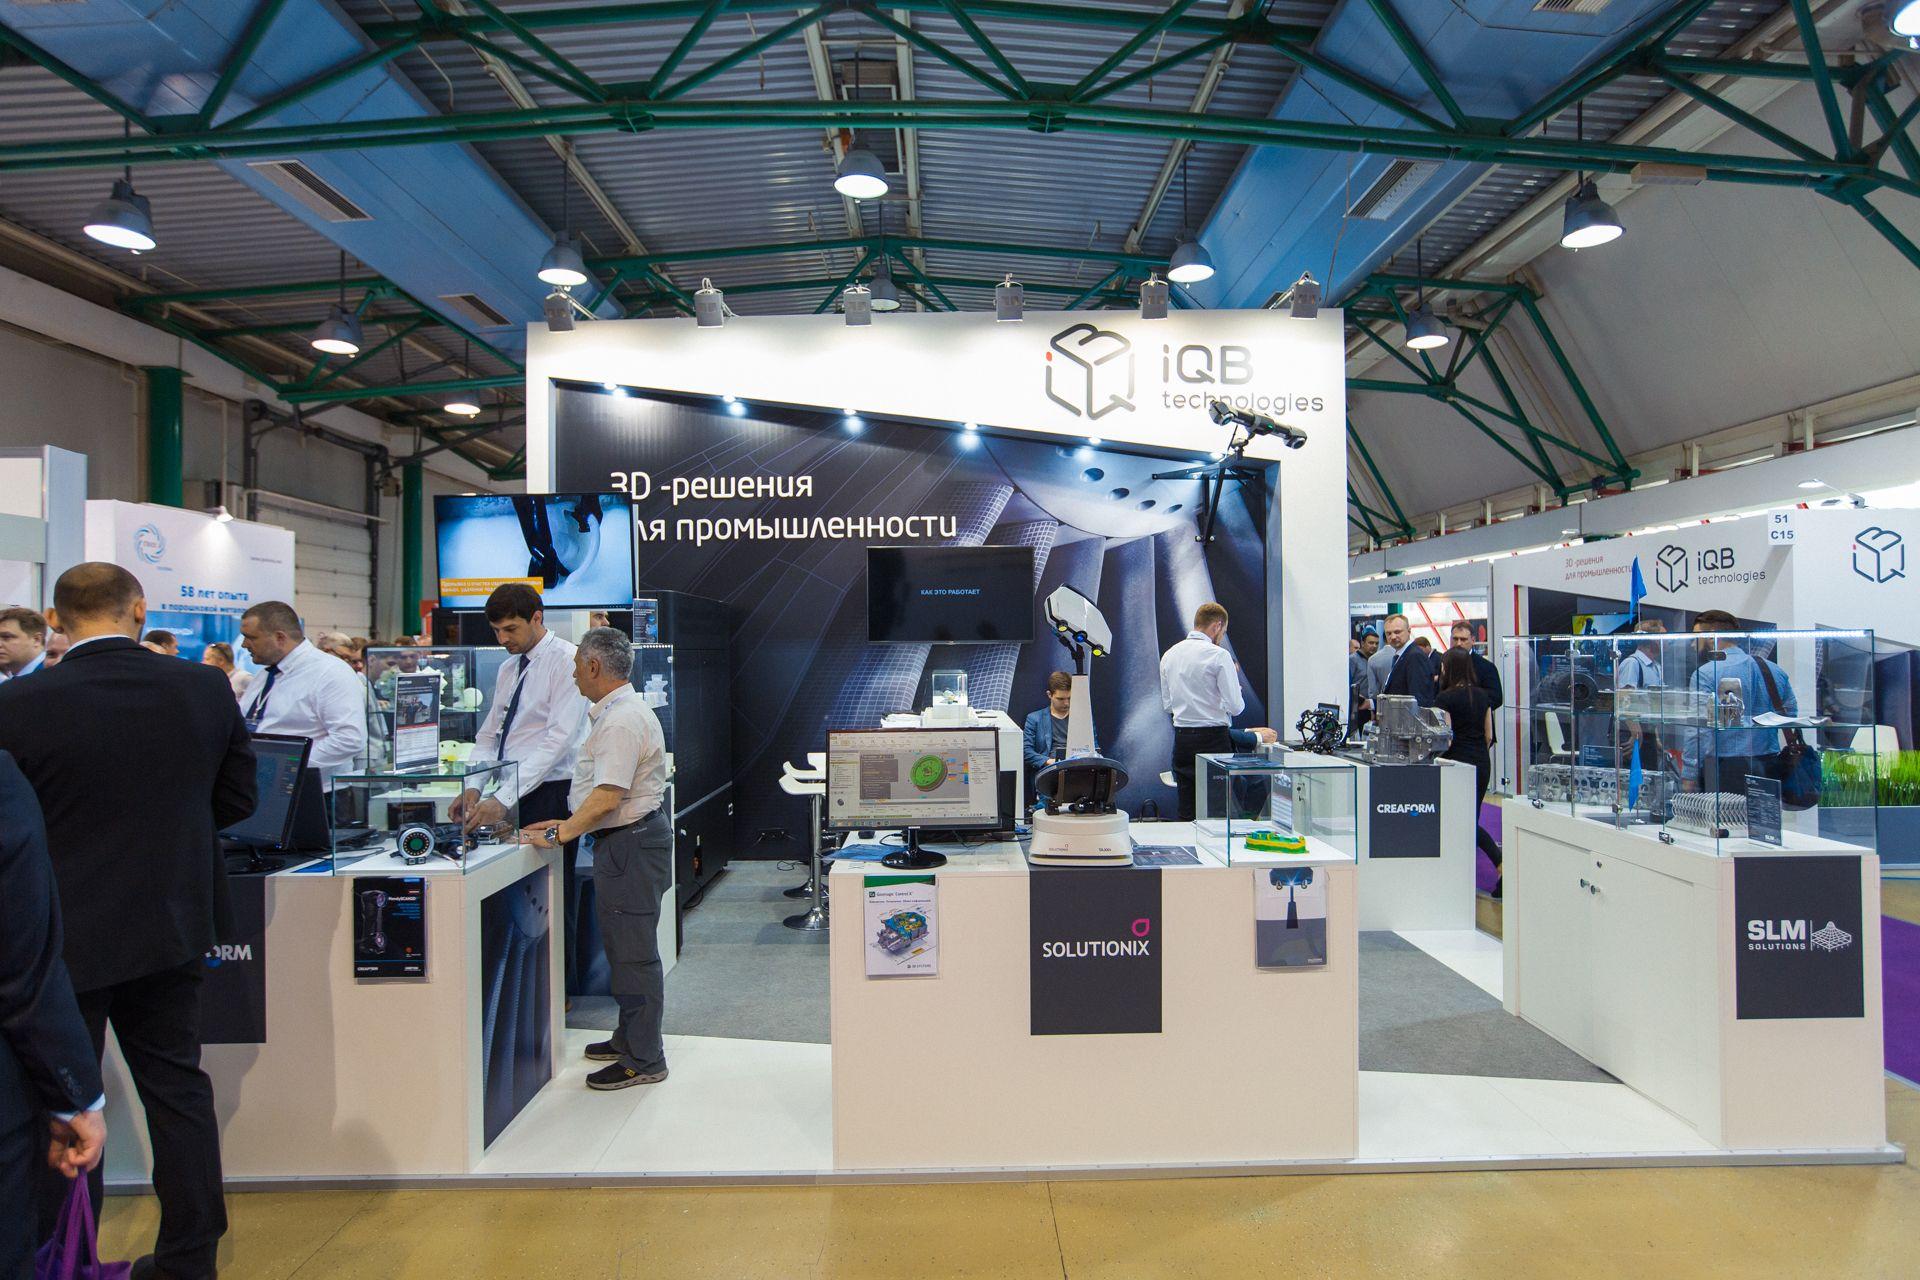 3D решения для промышленности на стенде iQB Technologies